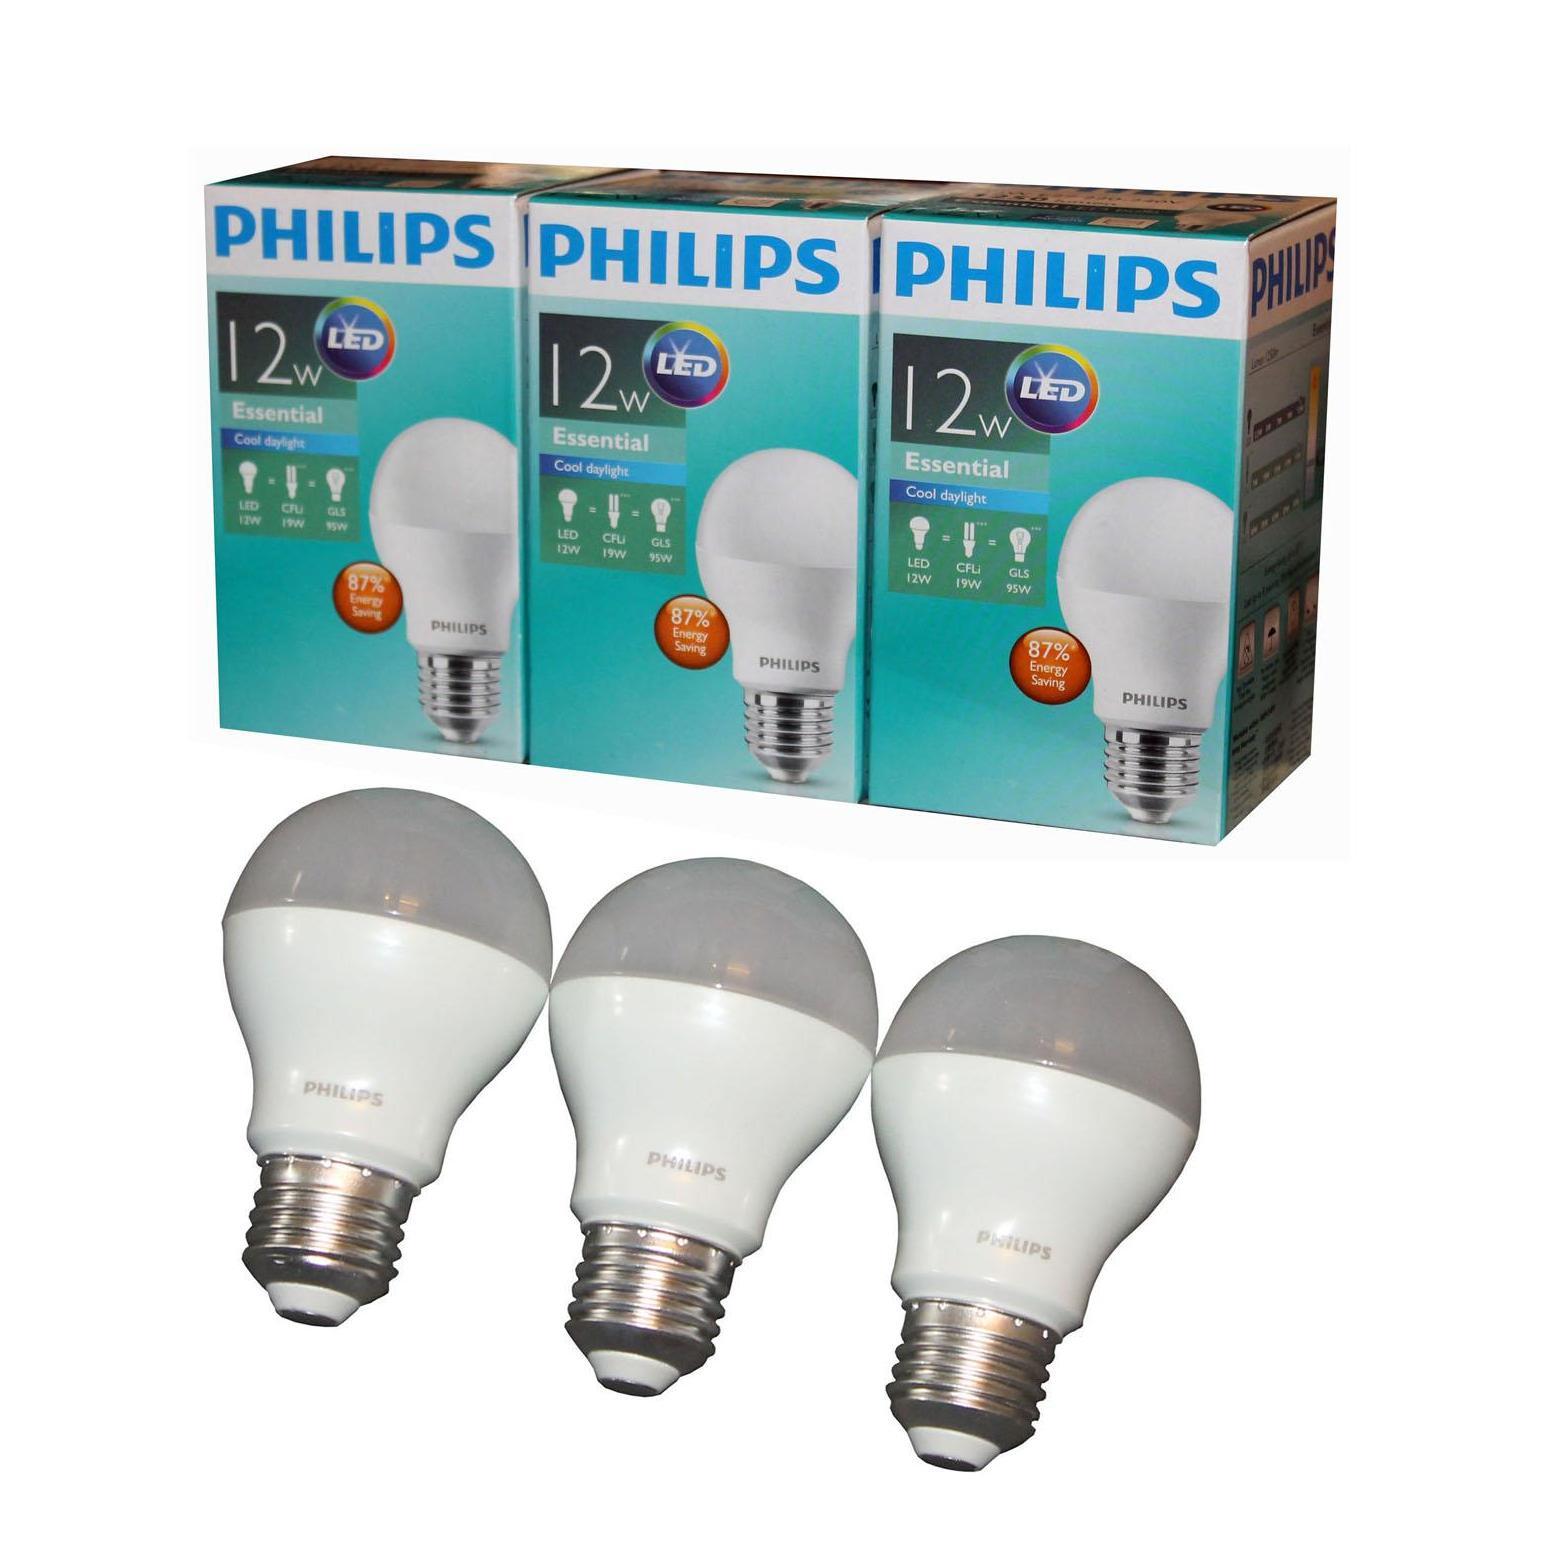 Berikut Daftar Harga Lampu Led Philips 12 Watt Termurah Di Phillips 13 Paketan Bulb Essential Wat W 12watt 12w Paket Isi 3 Pcs